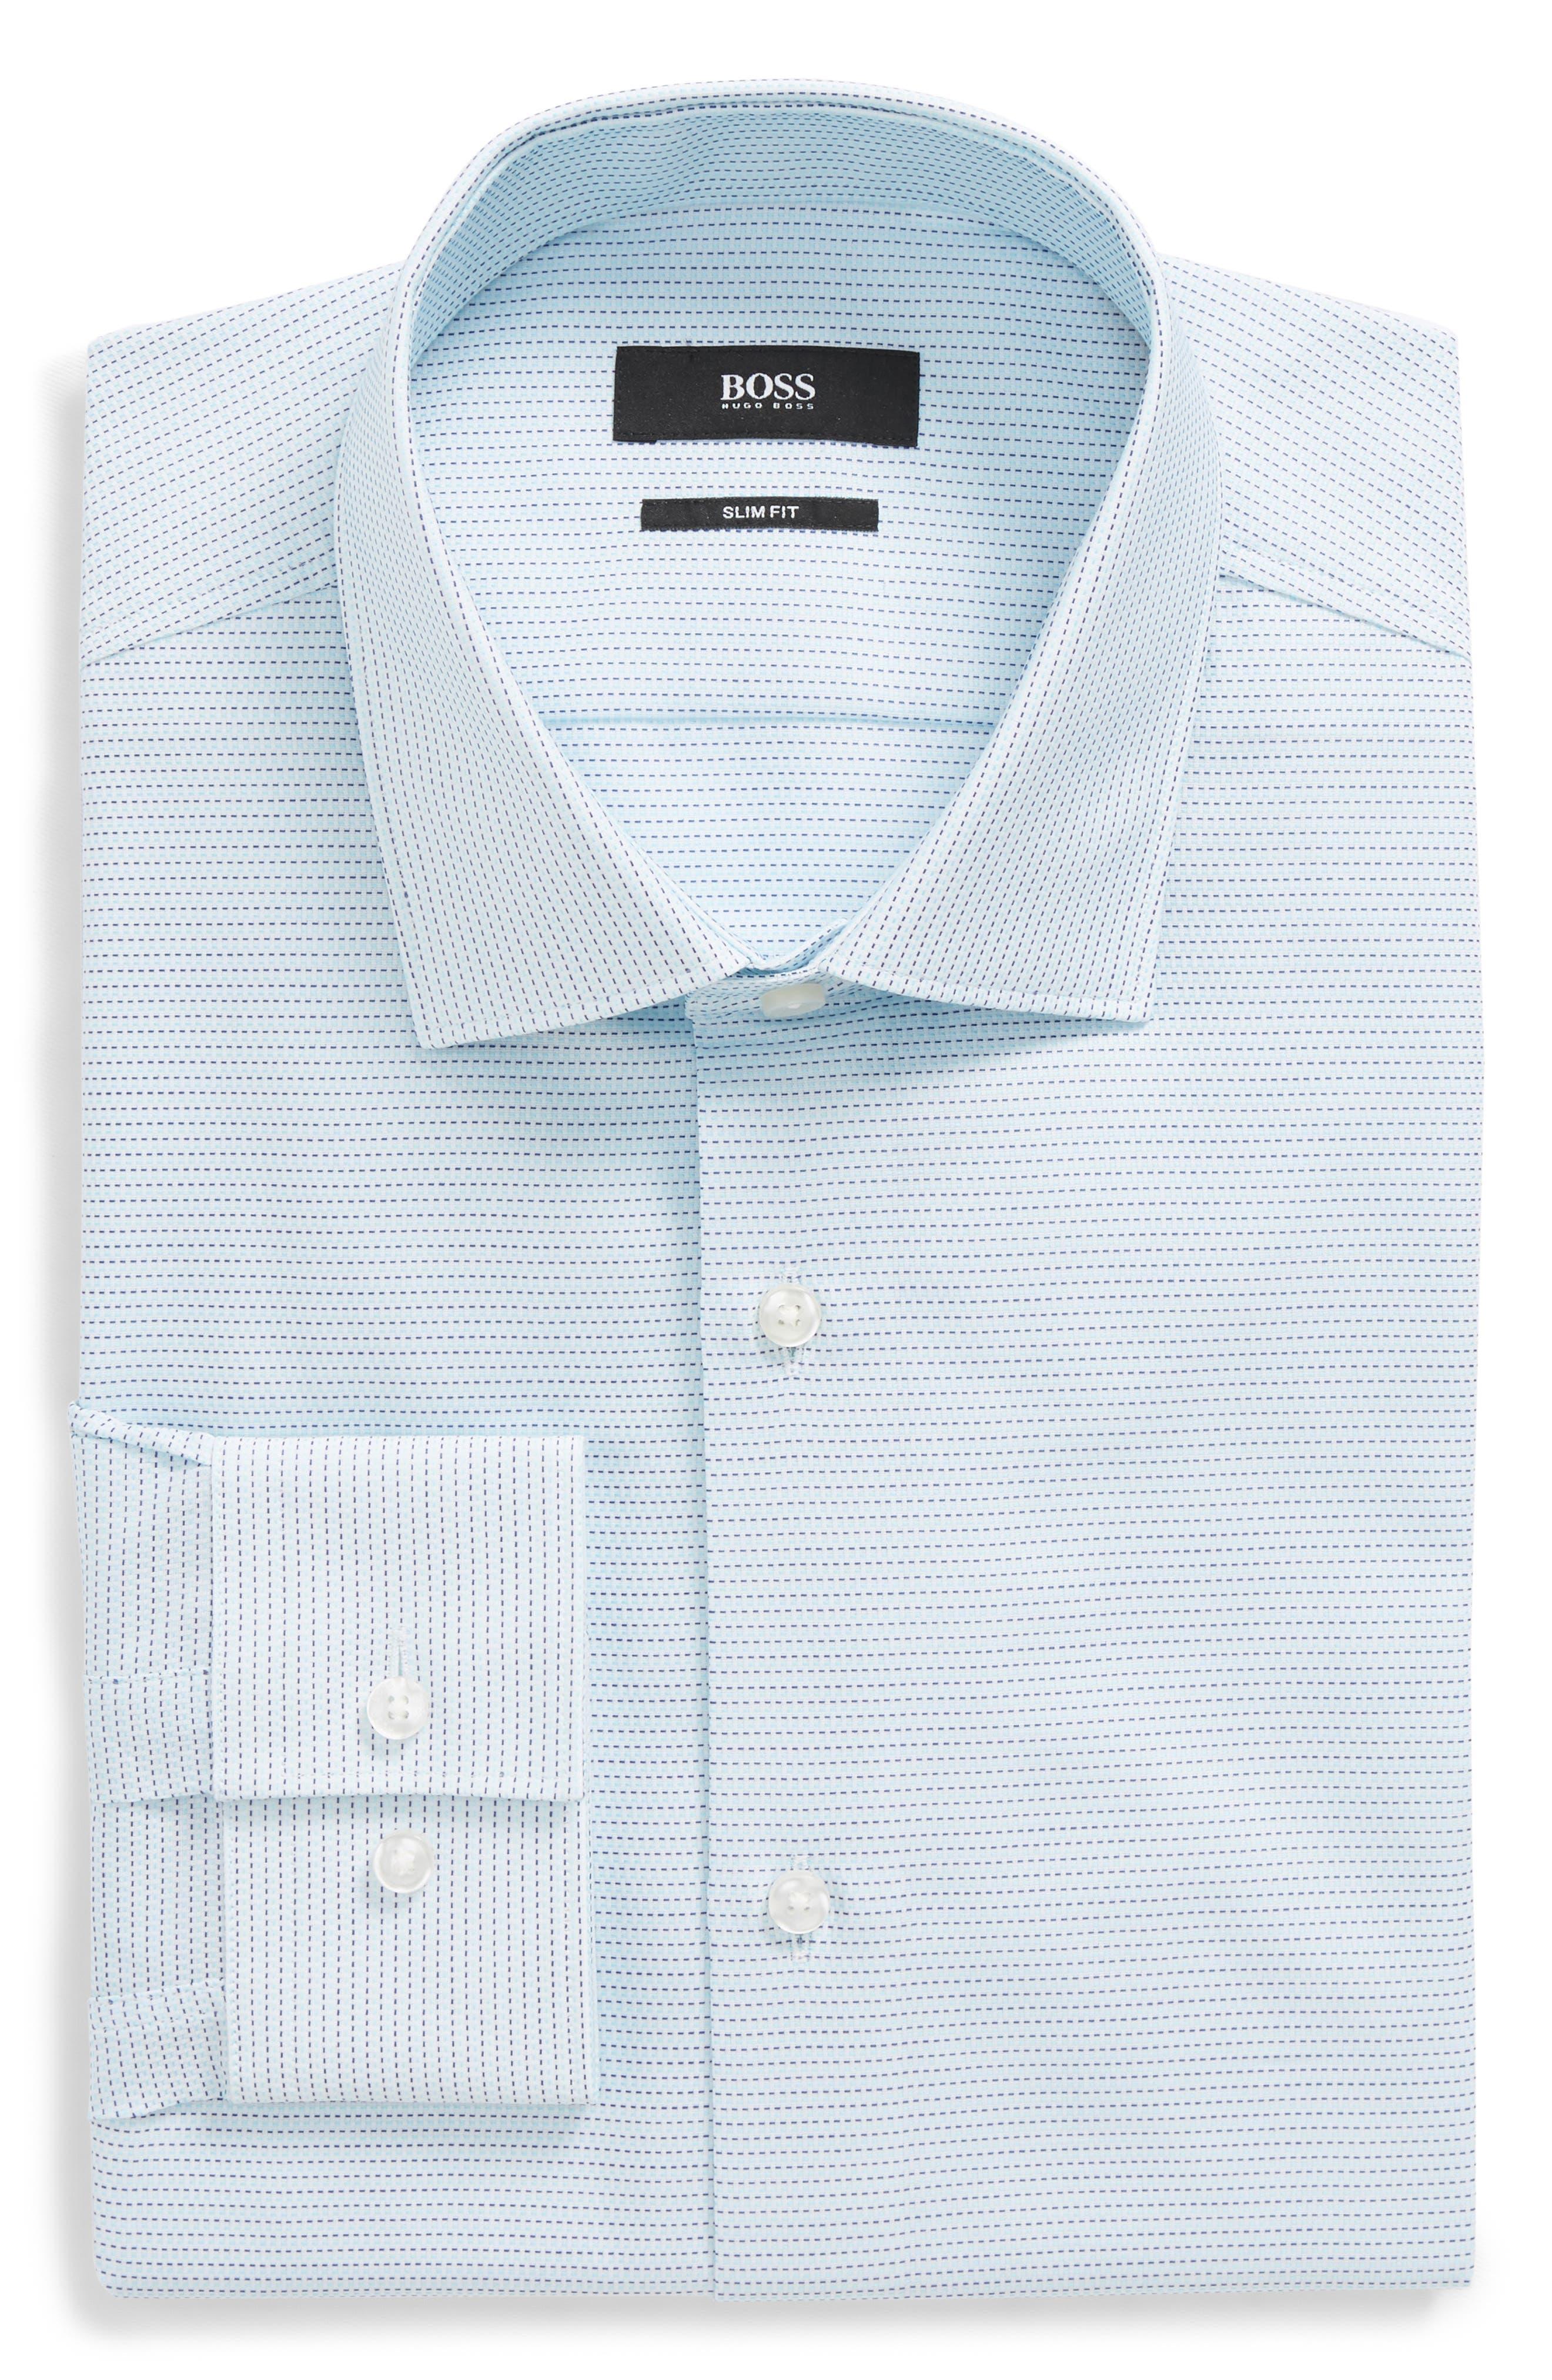 Ismo Slim Fit Solid Dress Shirt,                             Main thumbnail 1, color,                             435